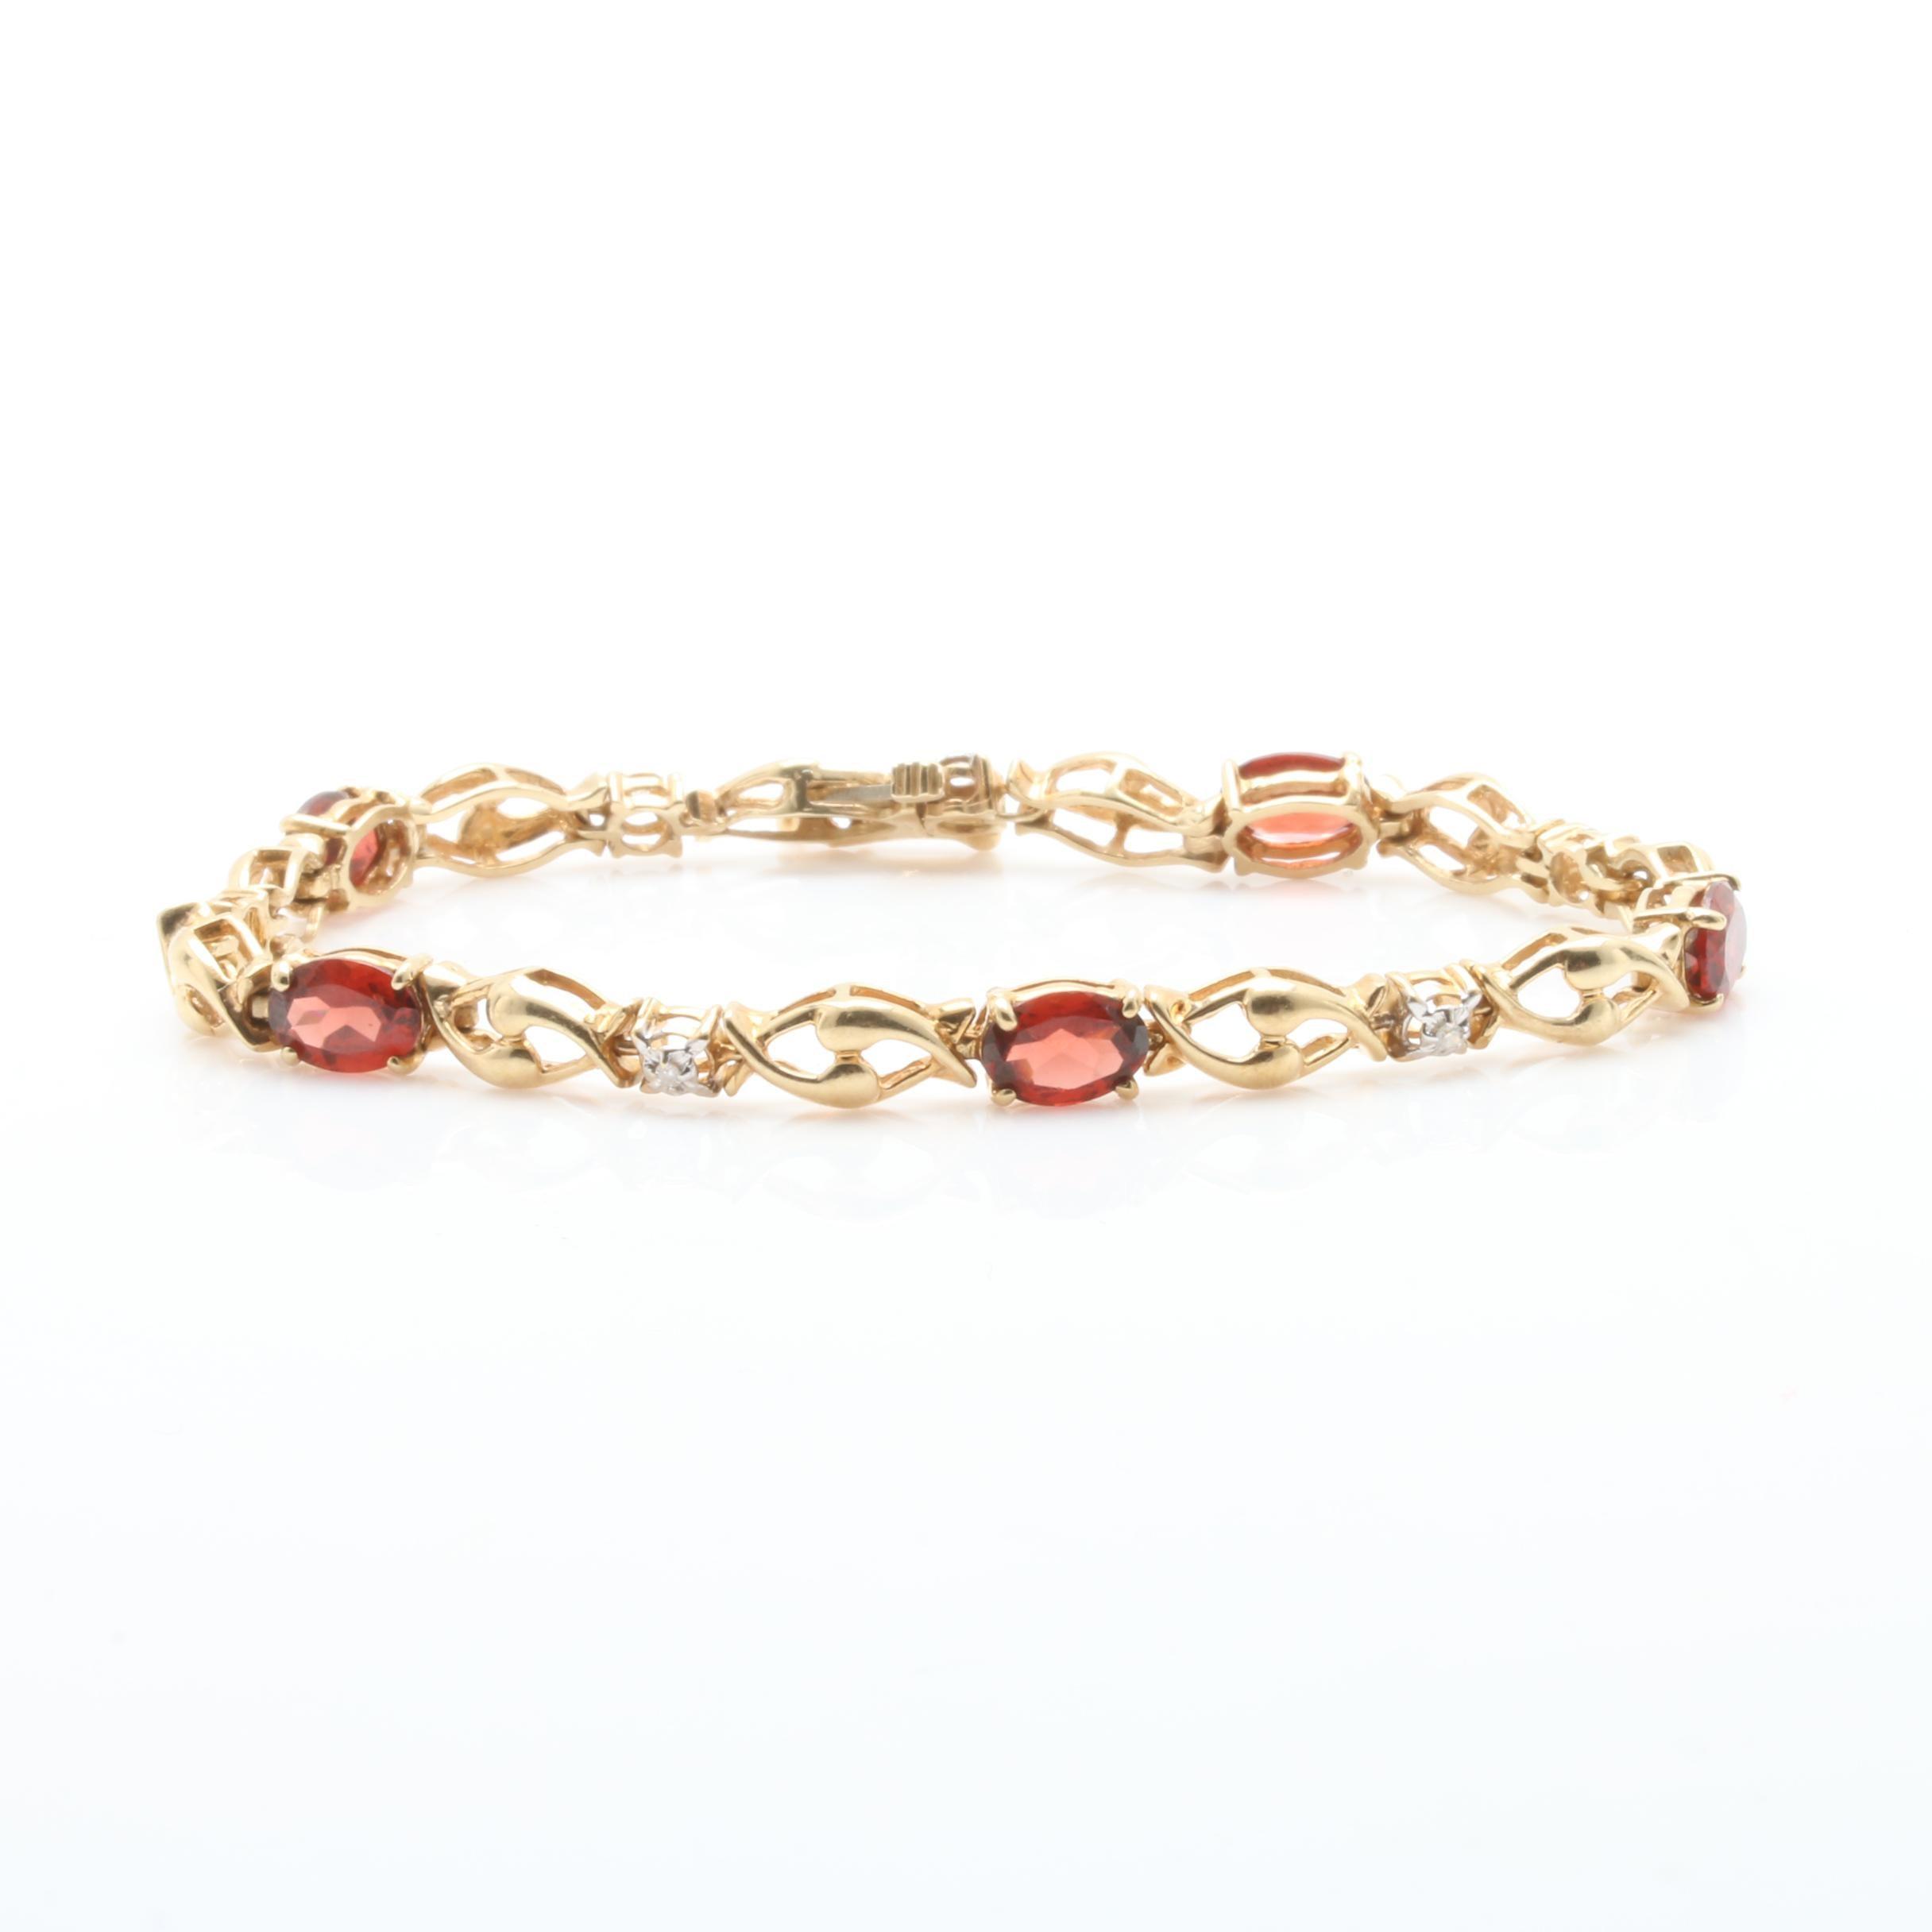 10K Yellow Gold Garnet and Diamond Bracelet